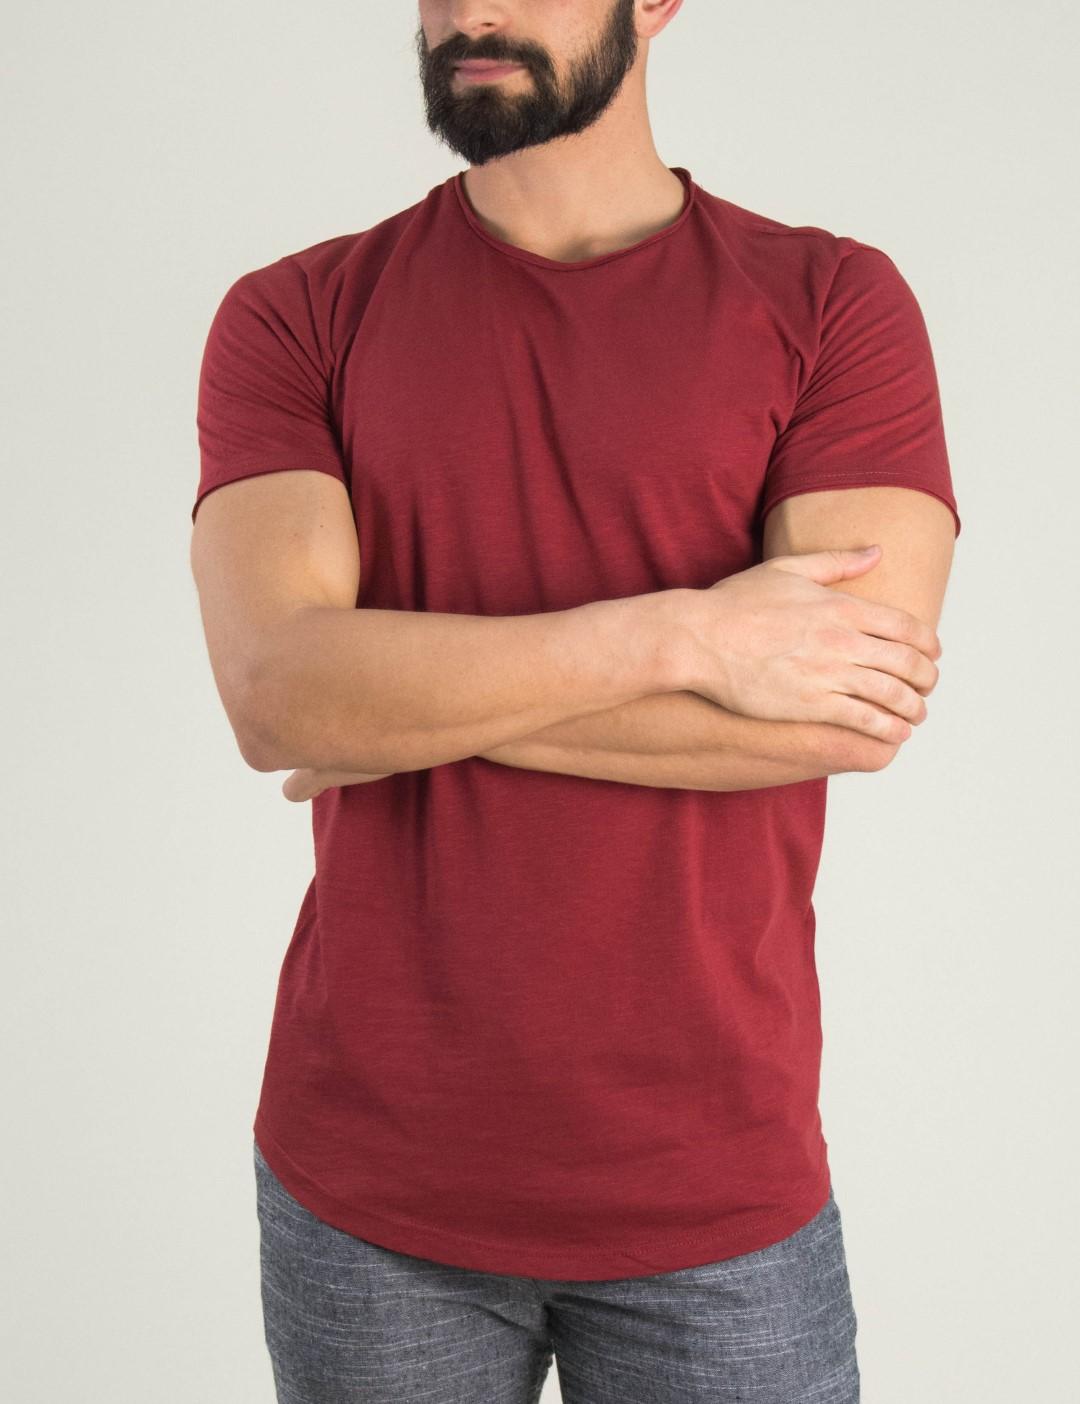 fc1a44b2970c Ανδρικό μπορντό t-shirt Brothers μονόχρωμο 19002